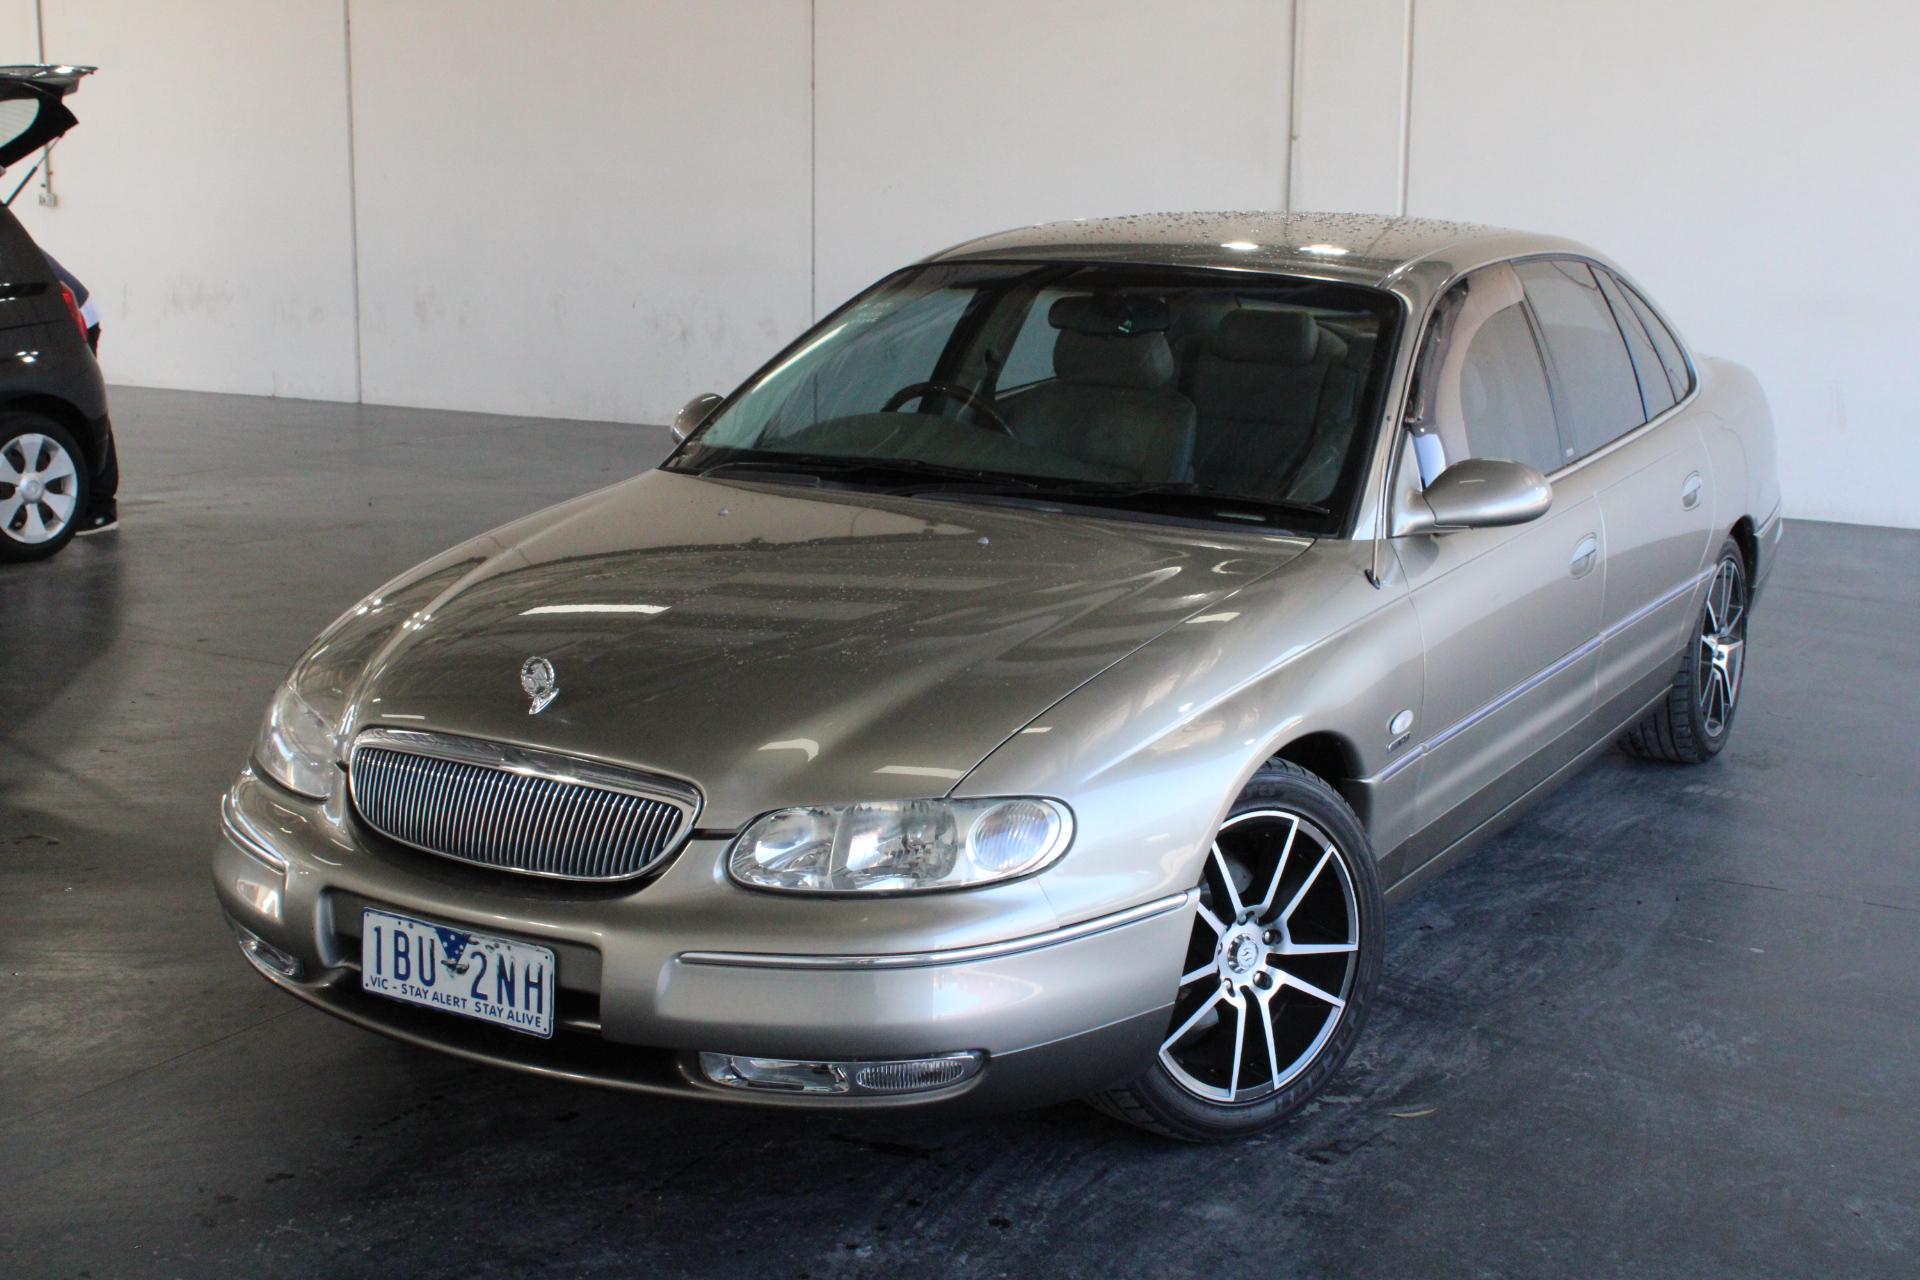 2002 Holden Caprice WH Automatic Sedan